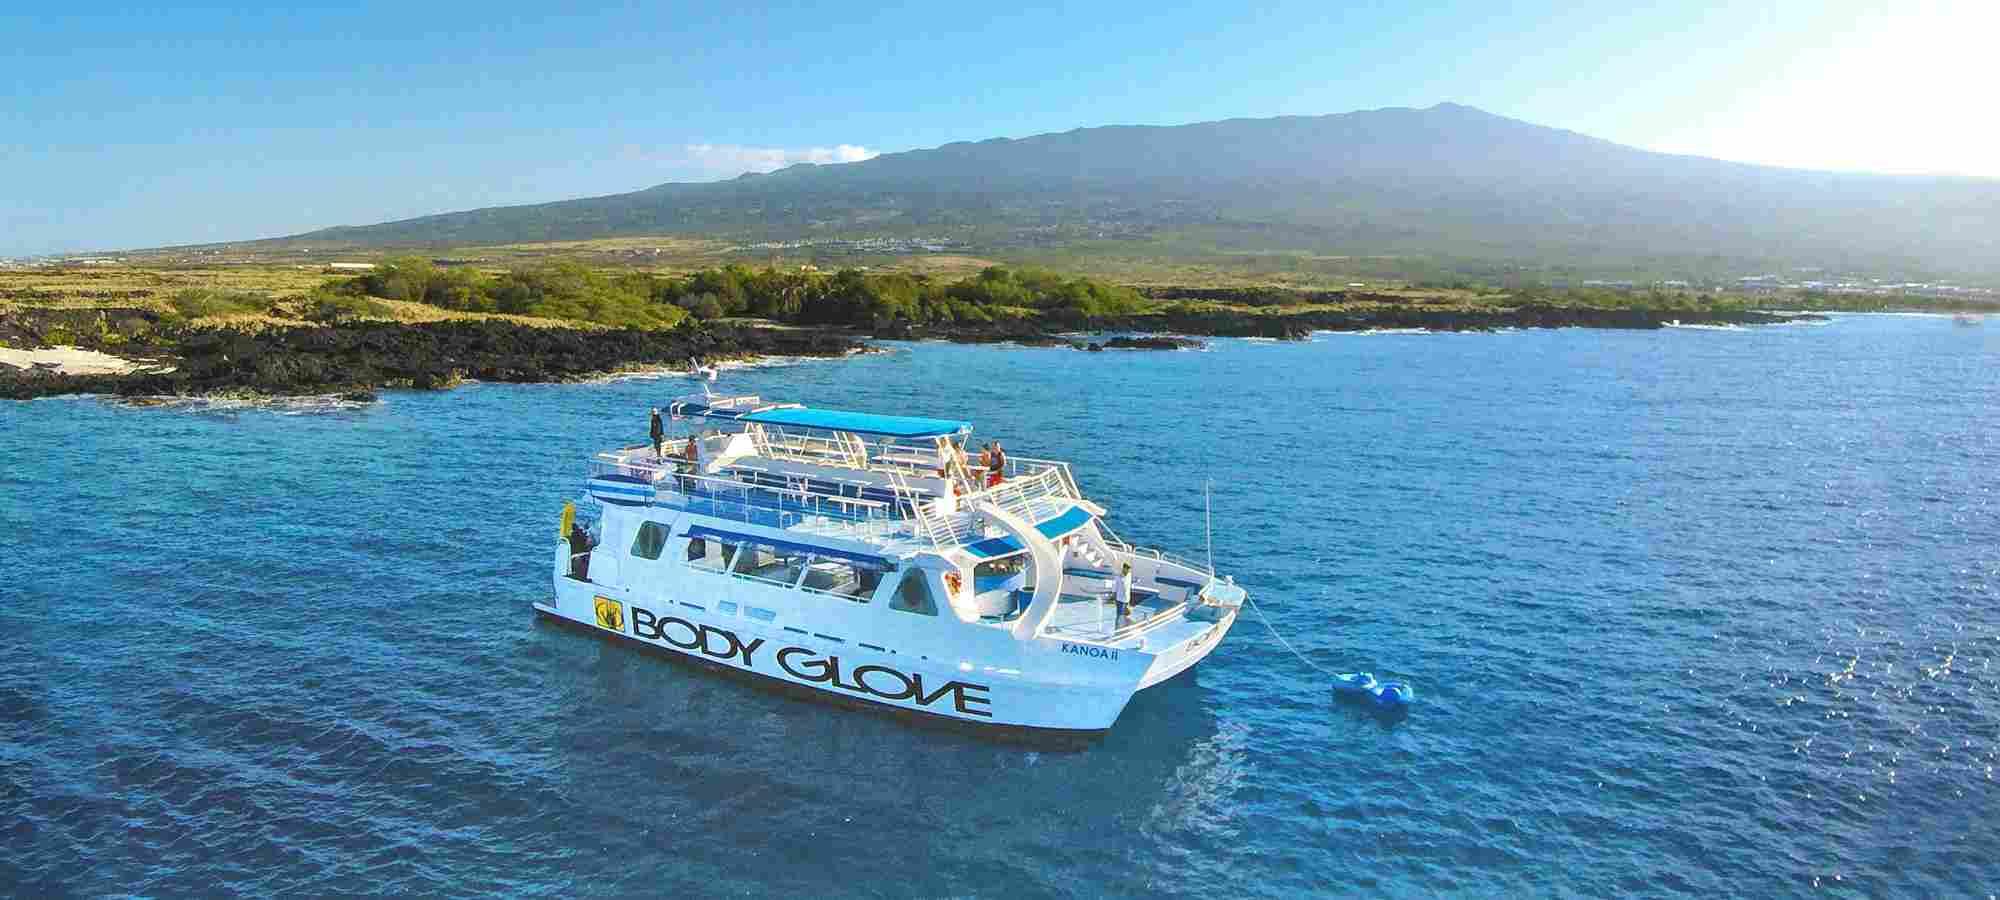 365Tickets partners Body Glove Hawaii Cruises